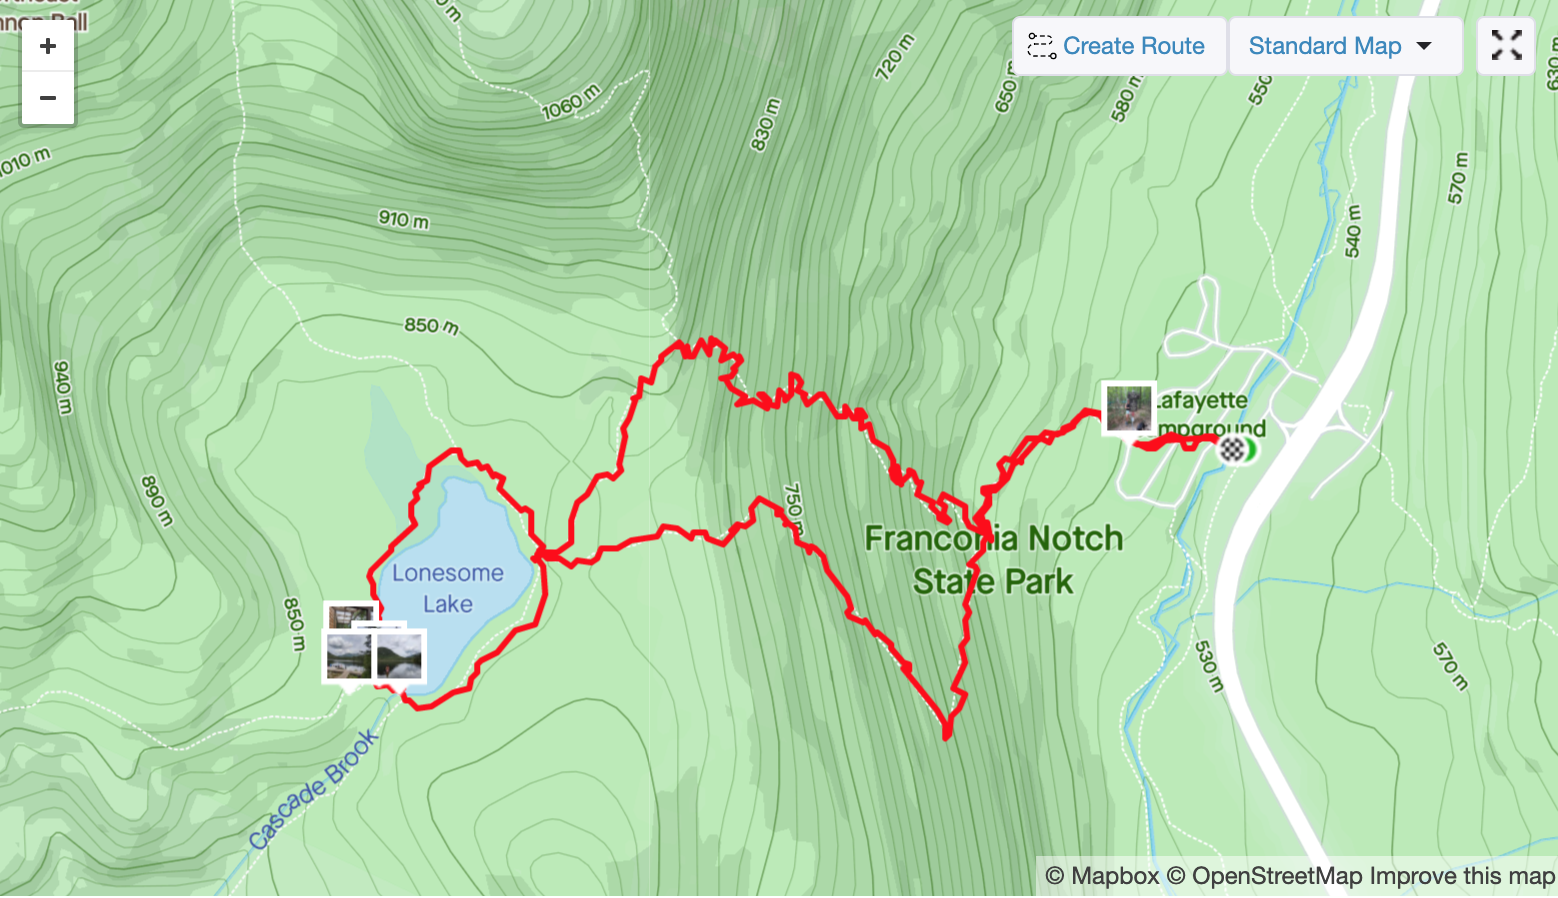 Lonesome Lake Trail Map